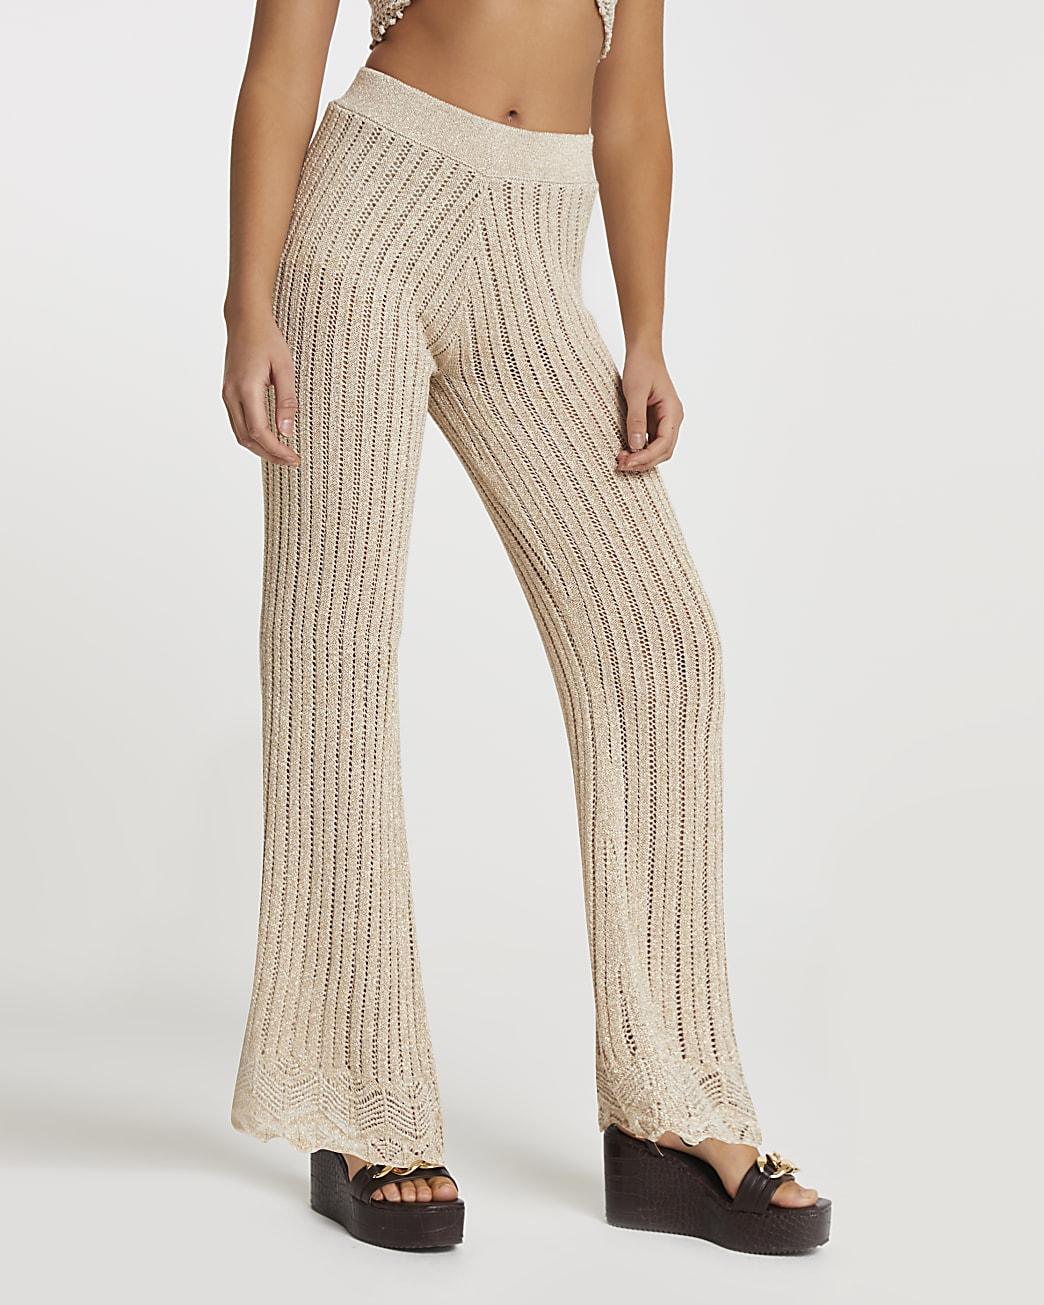 Rose gold crochet wide leg trousers